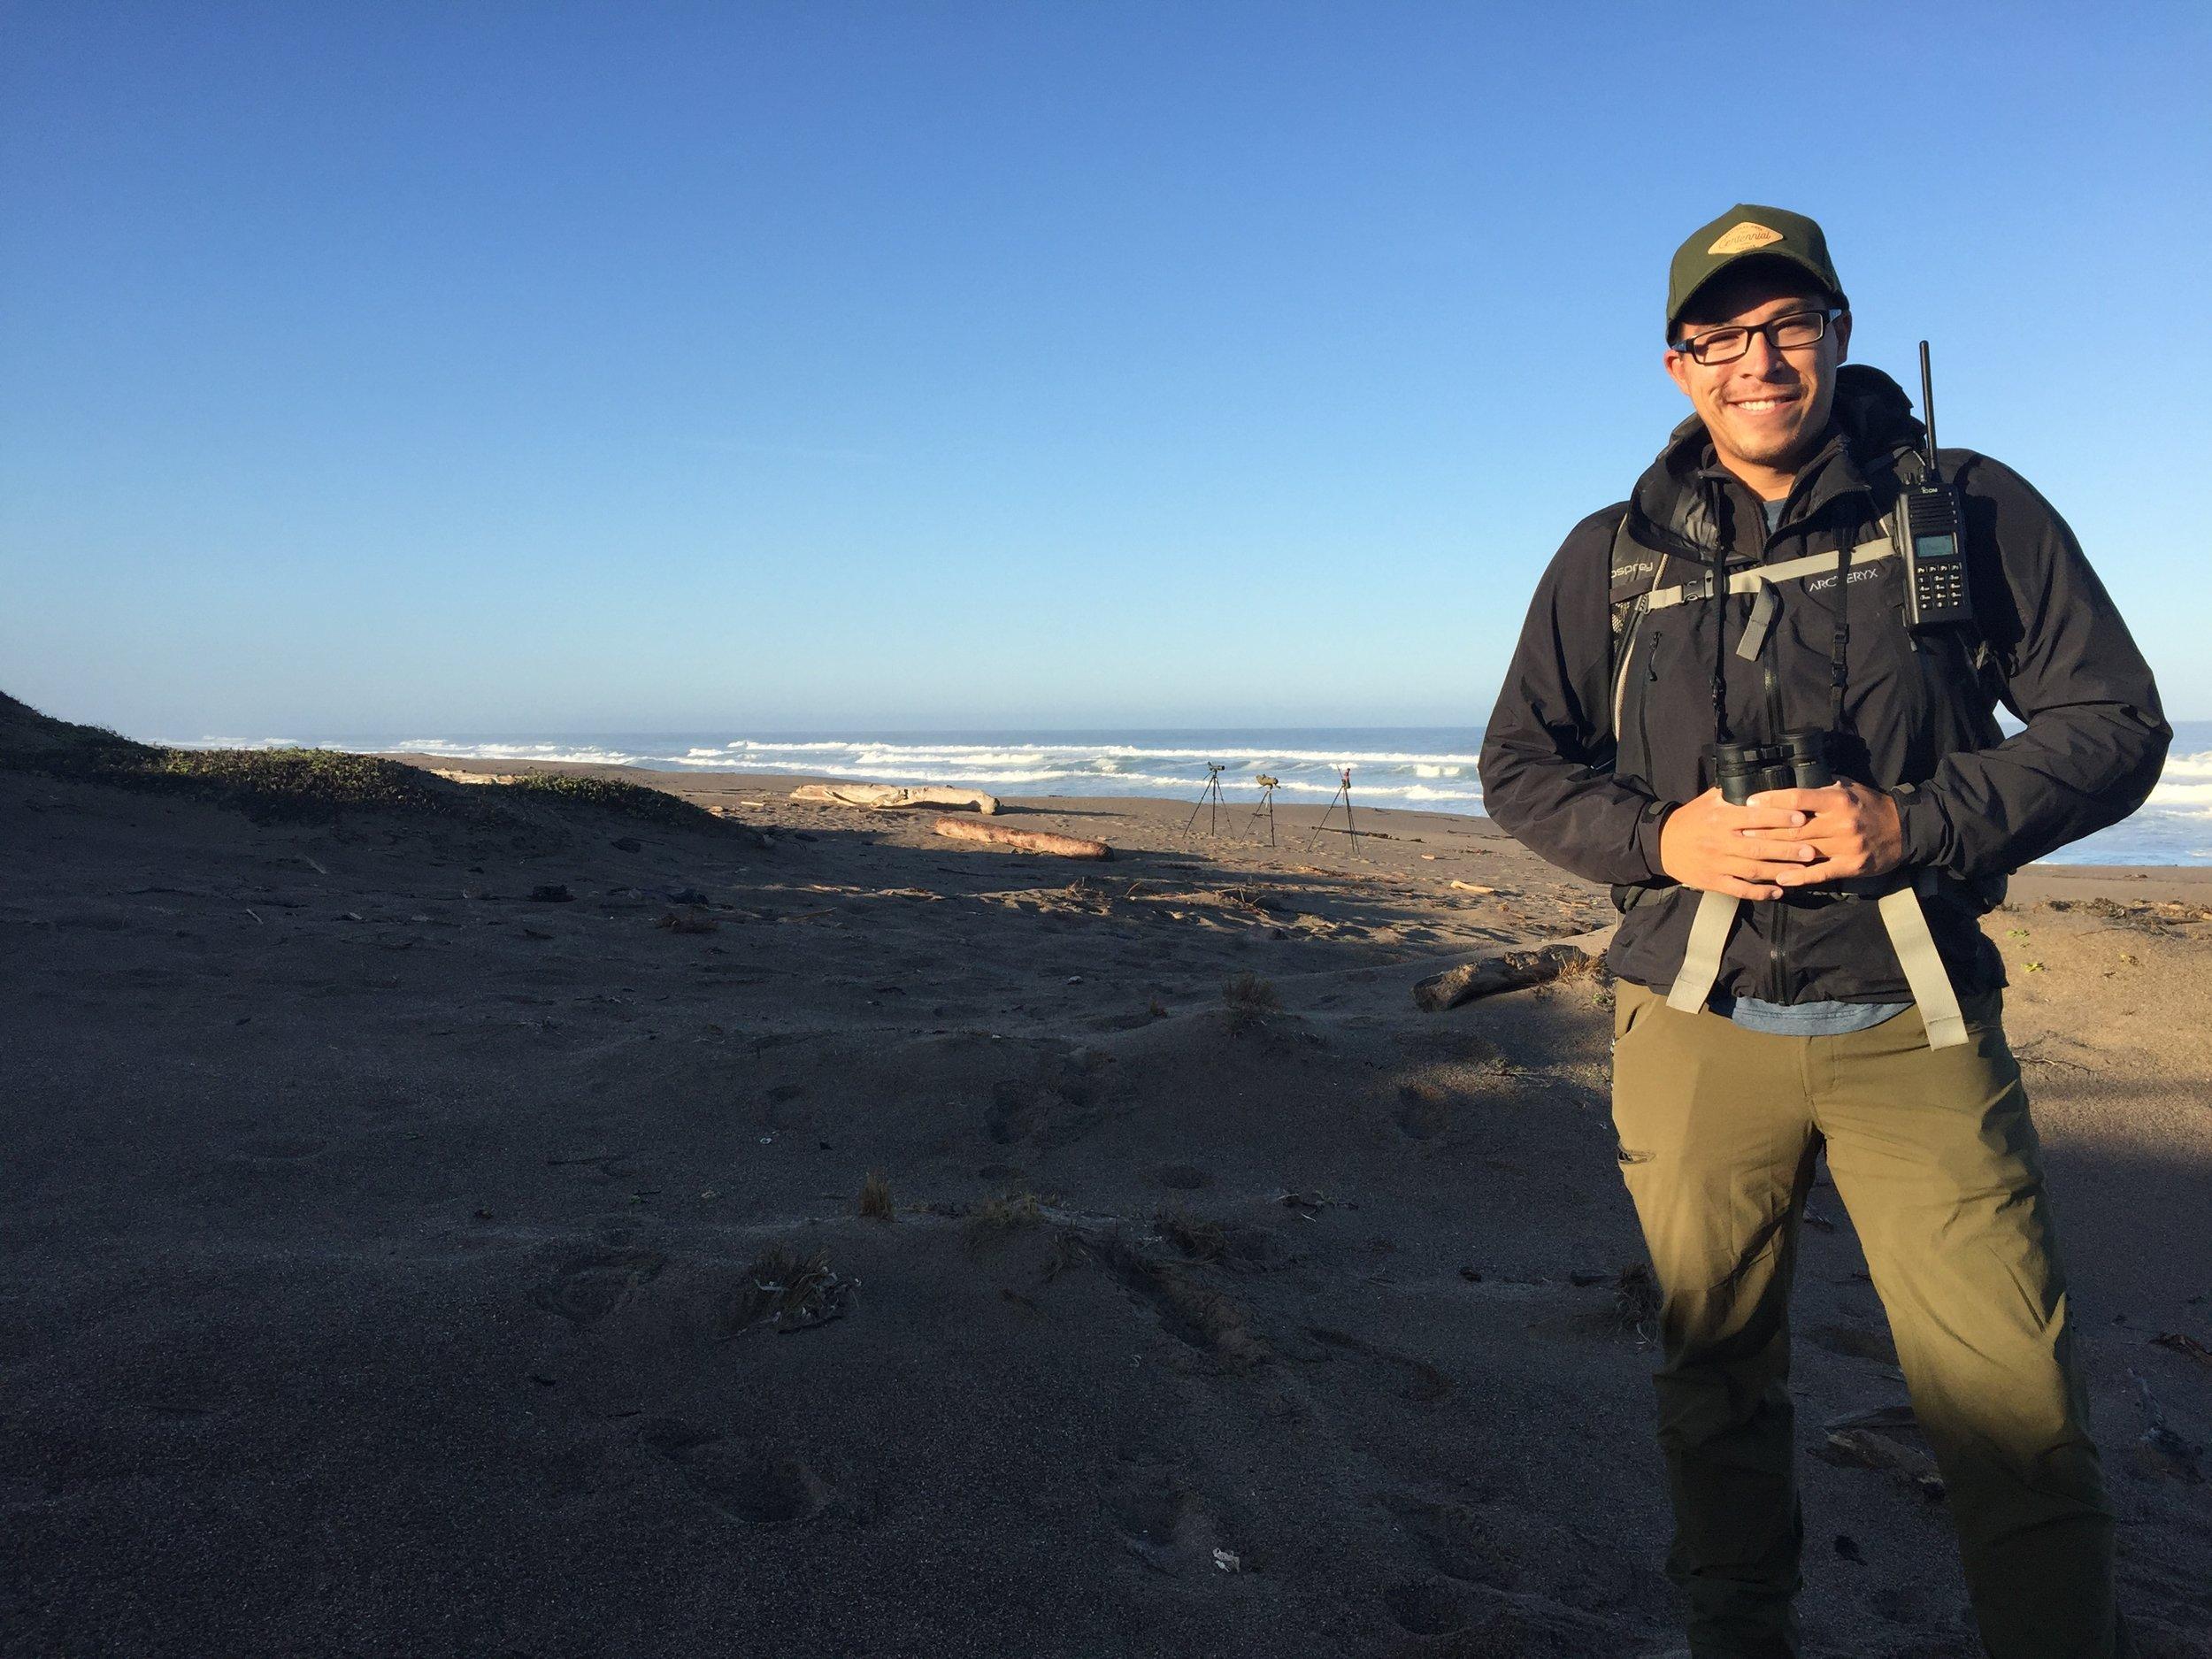 Matt Lau found the Lesser sand-plover while conducting Snowy Plover surveys along the beach in California.